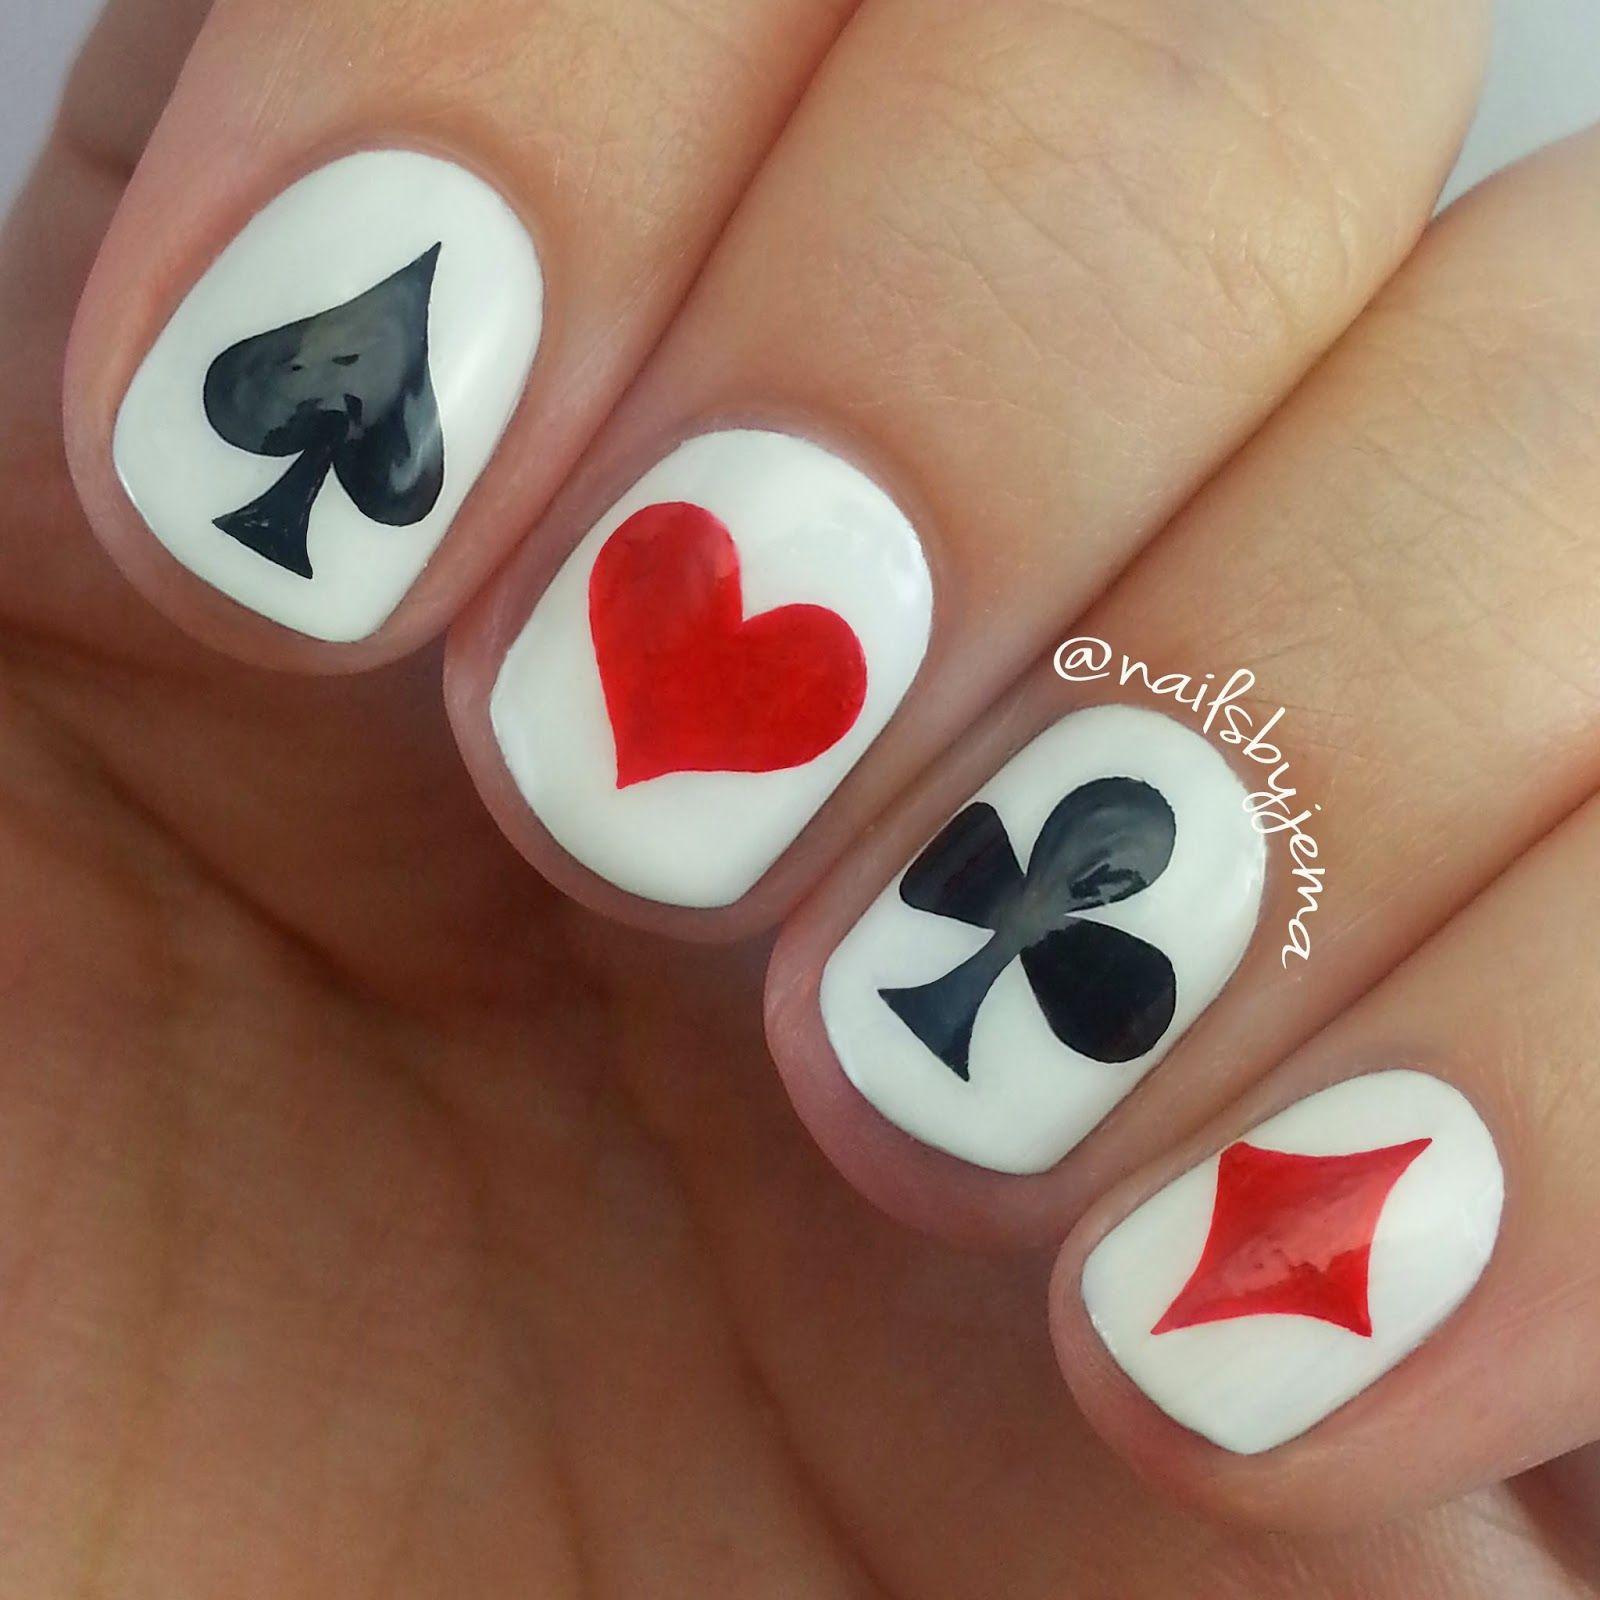 j e m a nailsbyjema instagram photos and videos las las vegas nail art google search prinsesfo Gallery